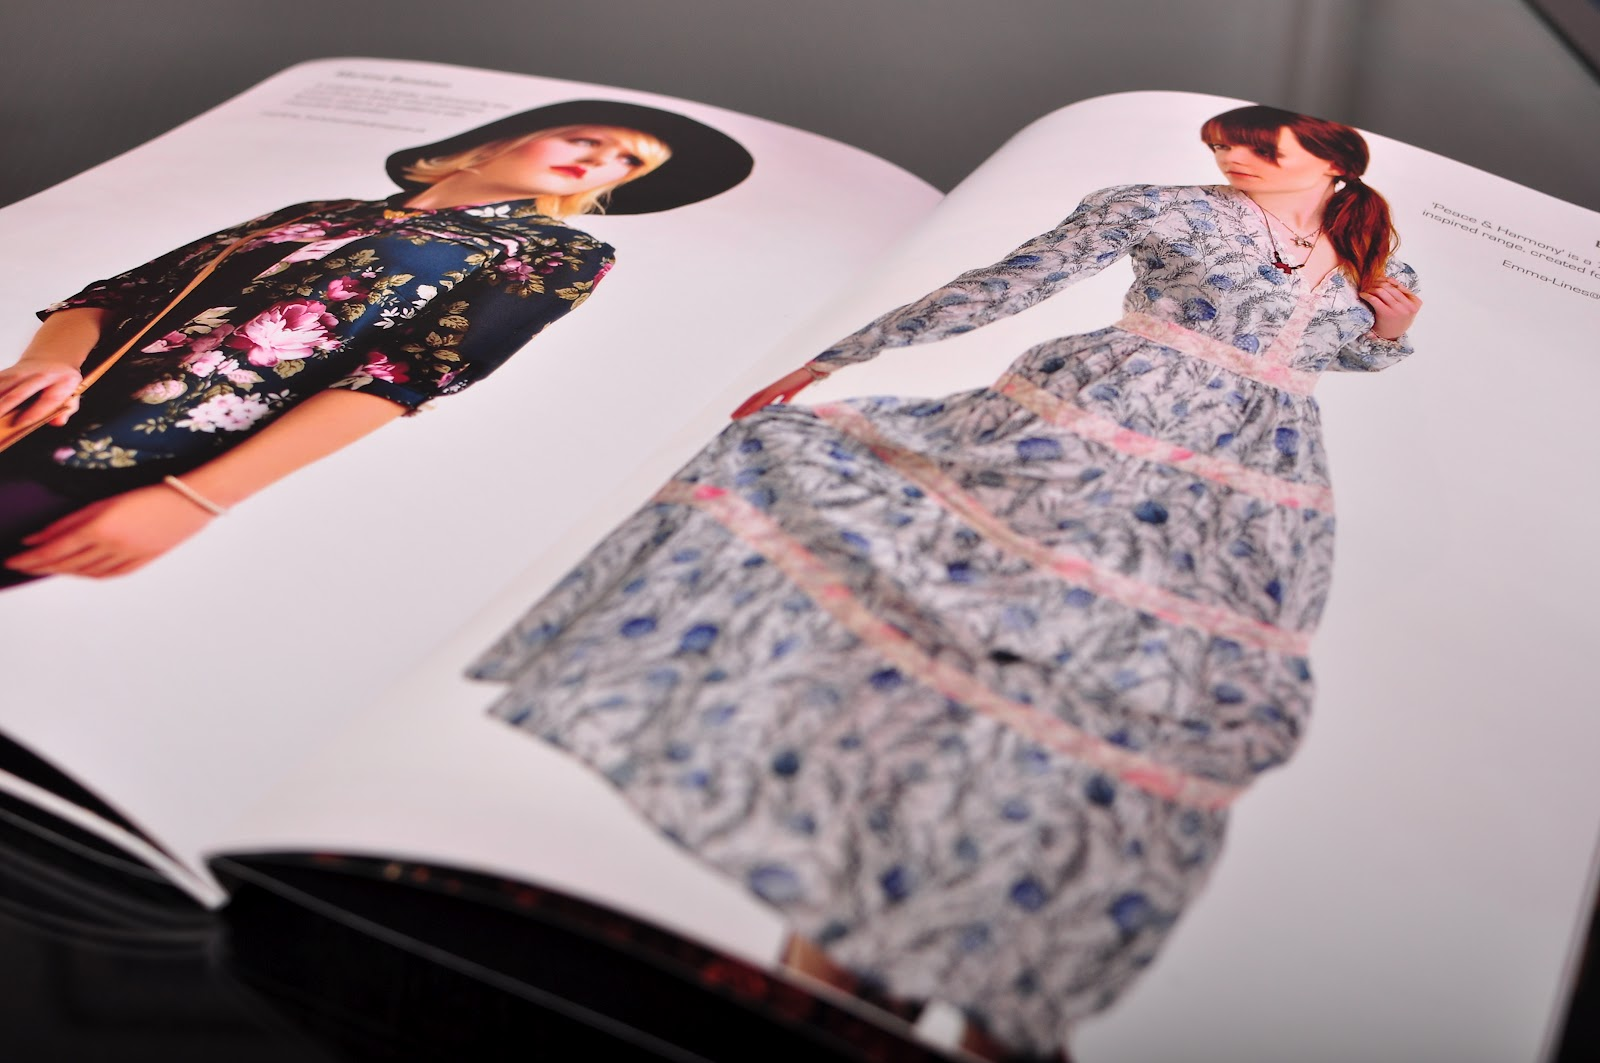 Manjaree jindal fashion designer M: The Big Book of Grandparents' Names